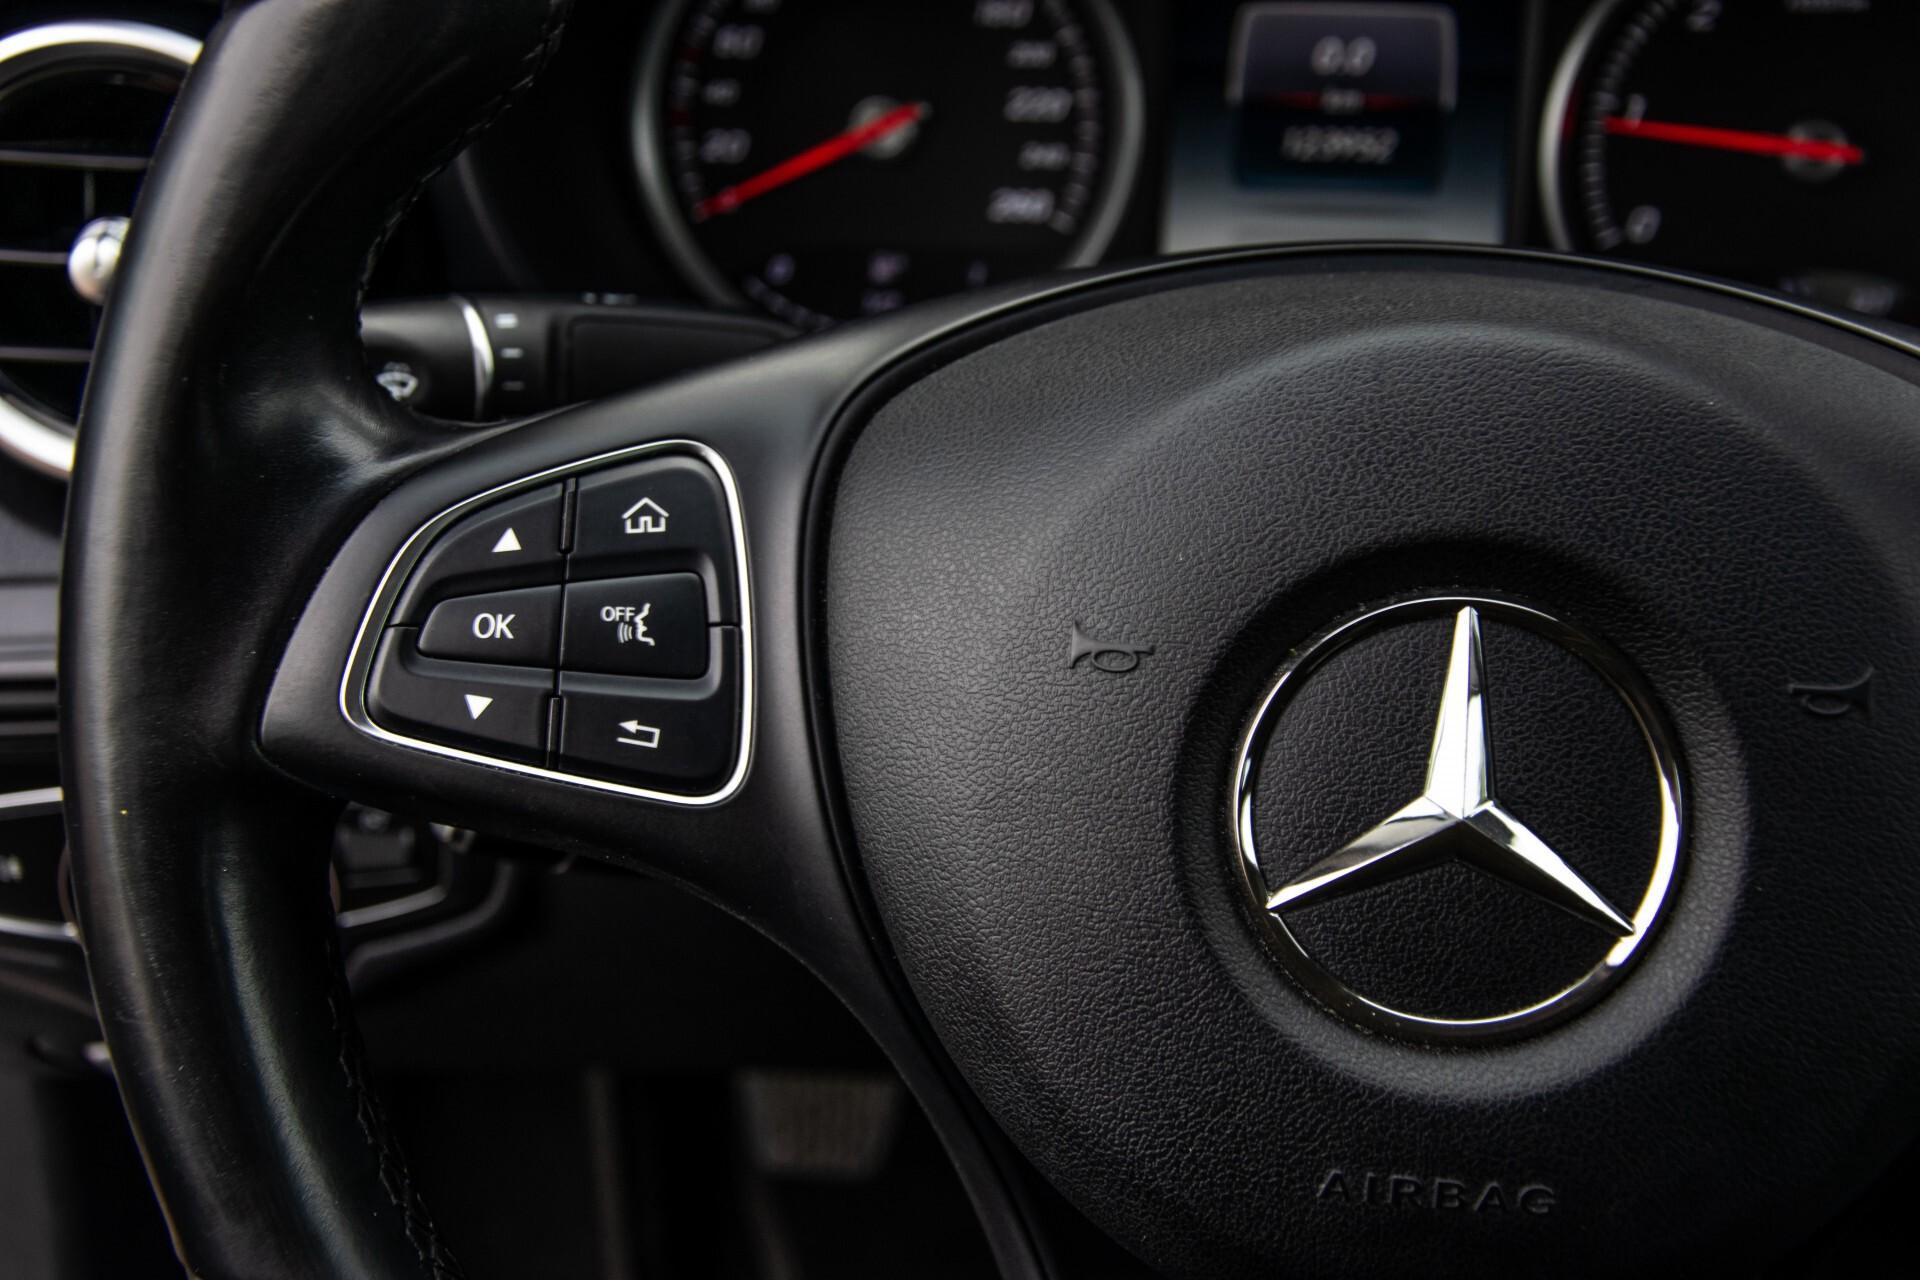 Mercedes-Benz C-Klasse 180 Bluetec Lease Edition Intelligent Light System/Cruise Control/Navi Foto 9